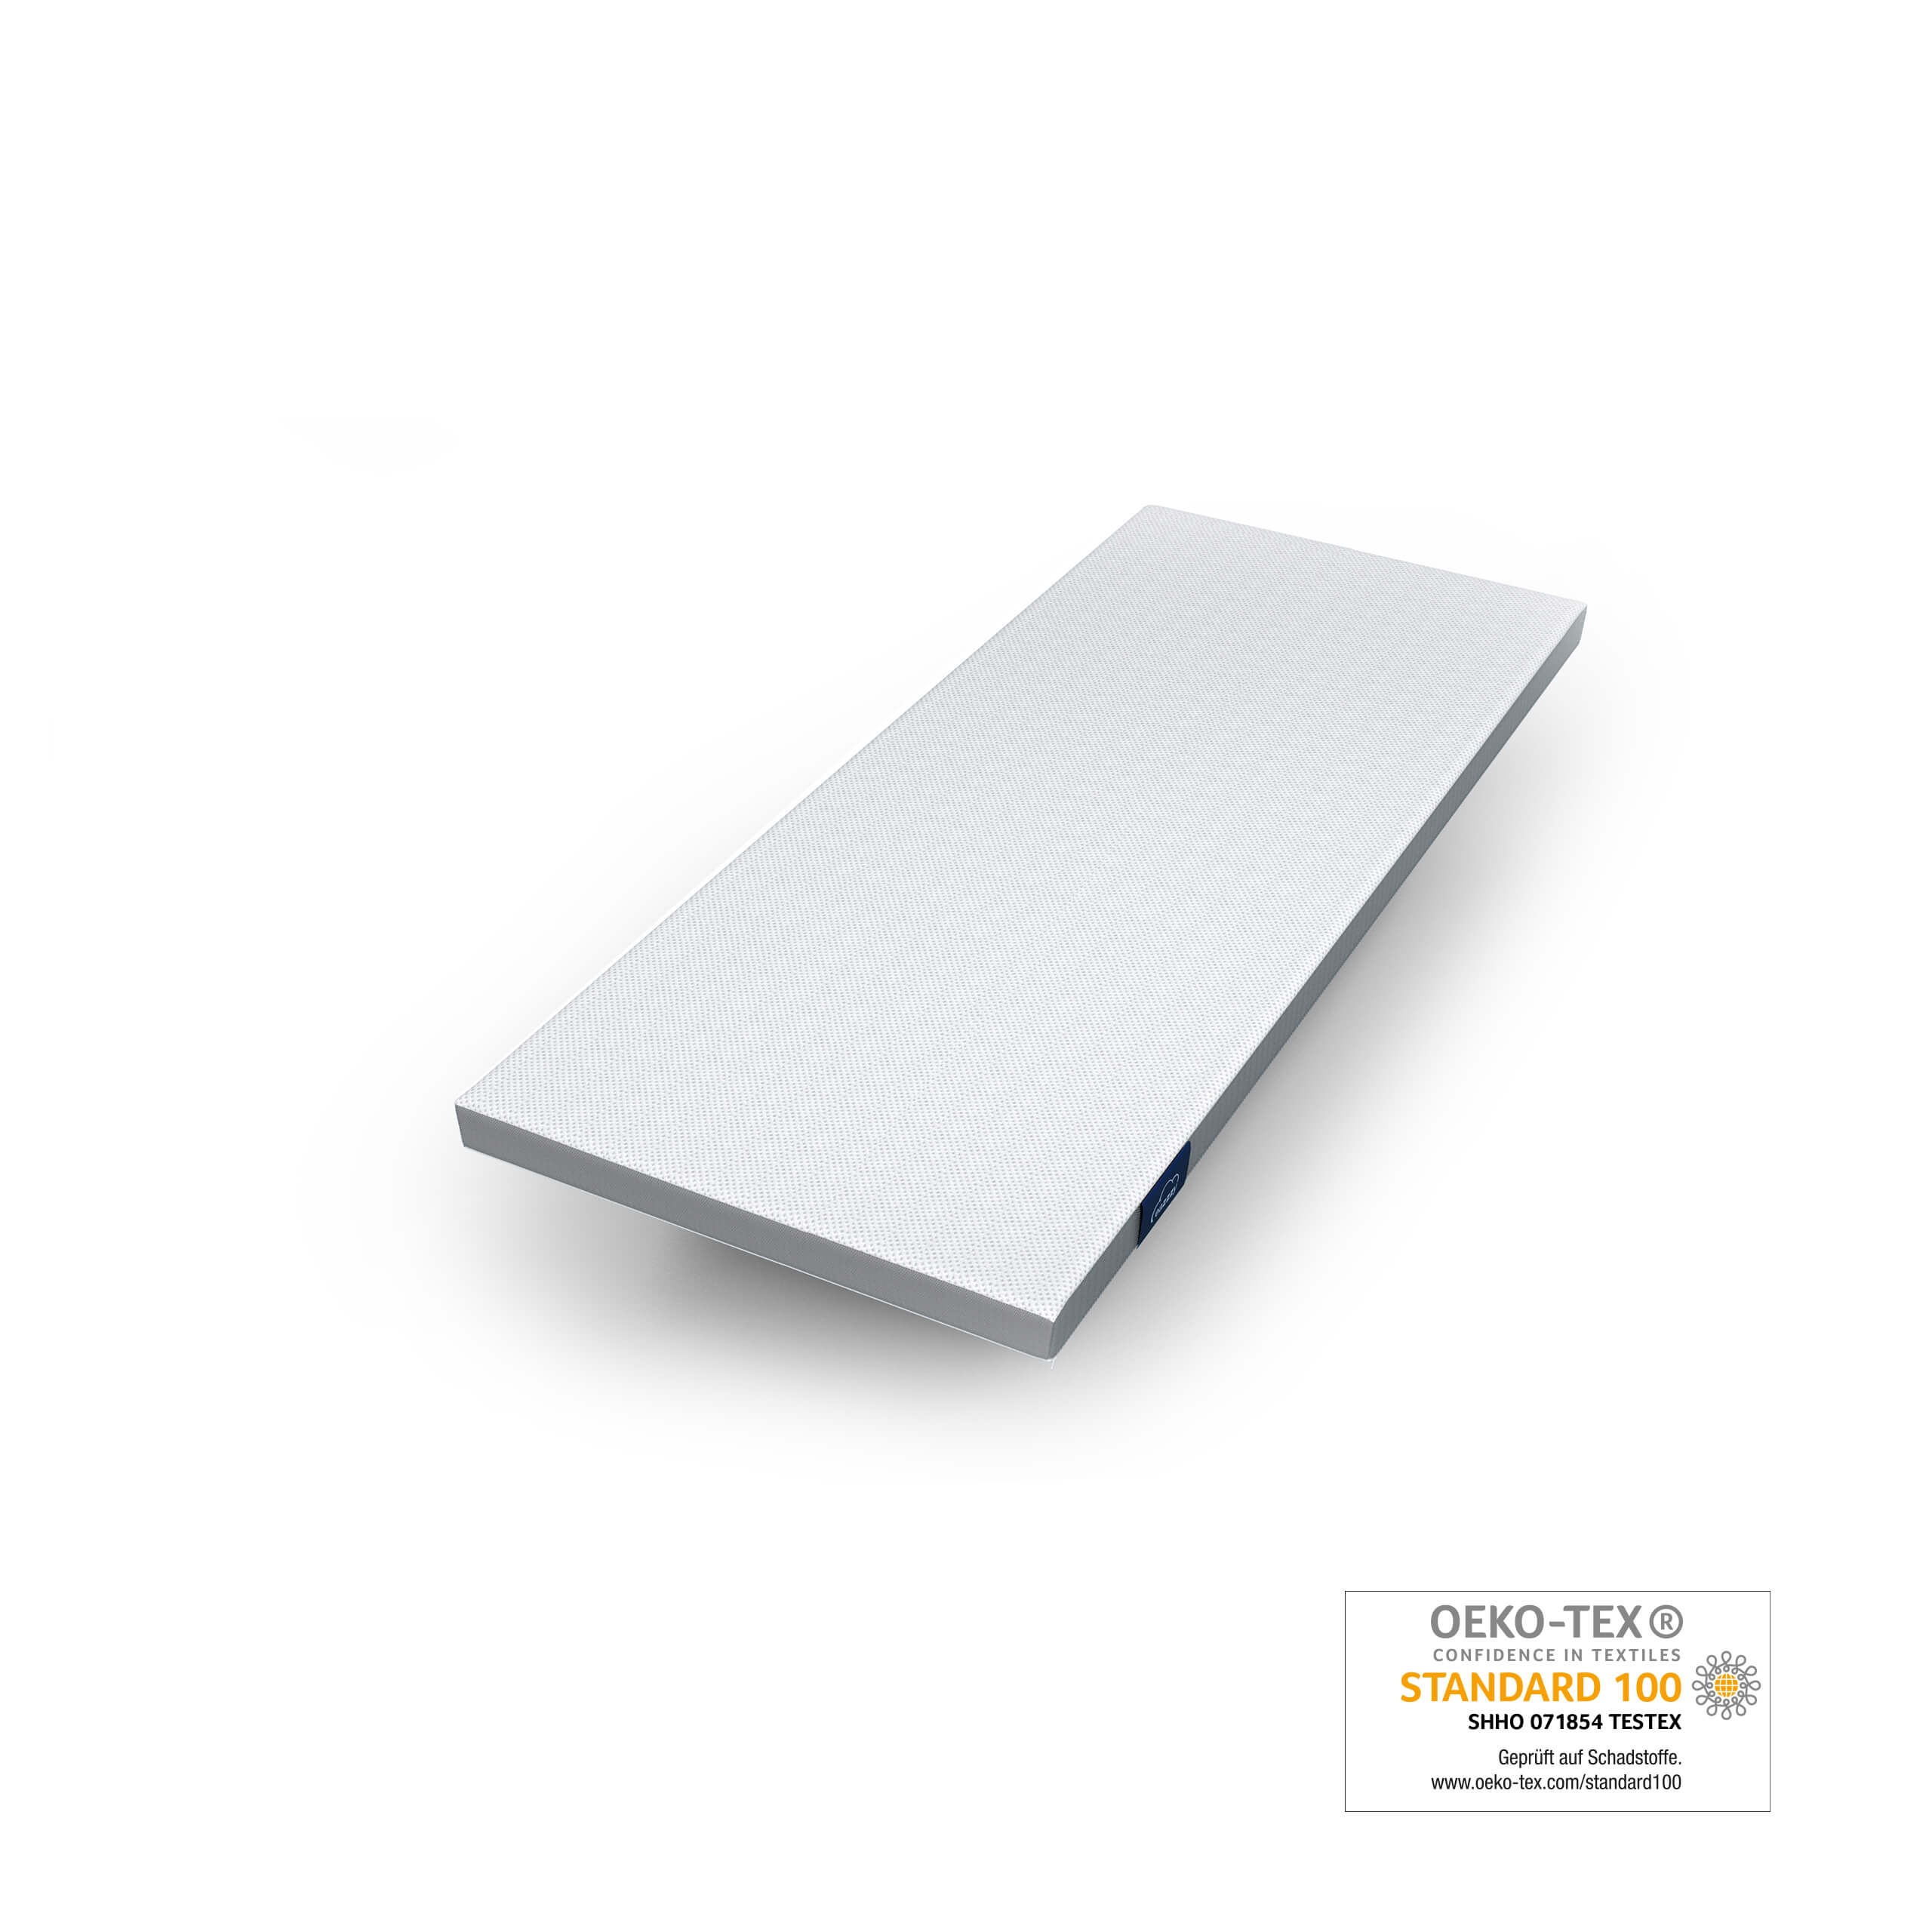 Genius eazzzy | Matratzentopper 80 x 200 x 7 cm A19301